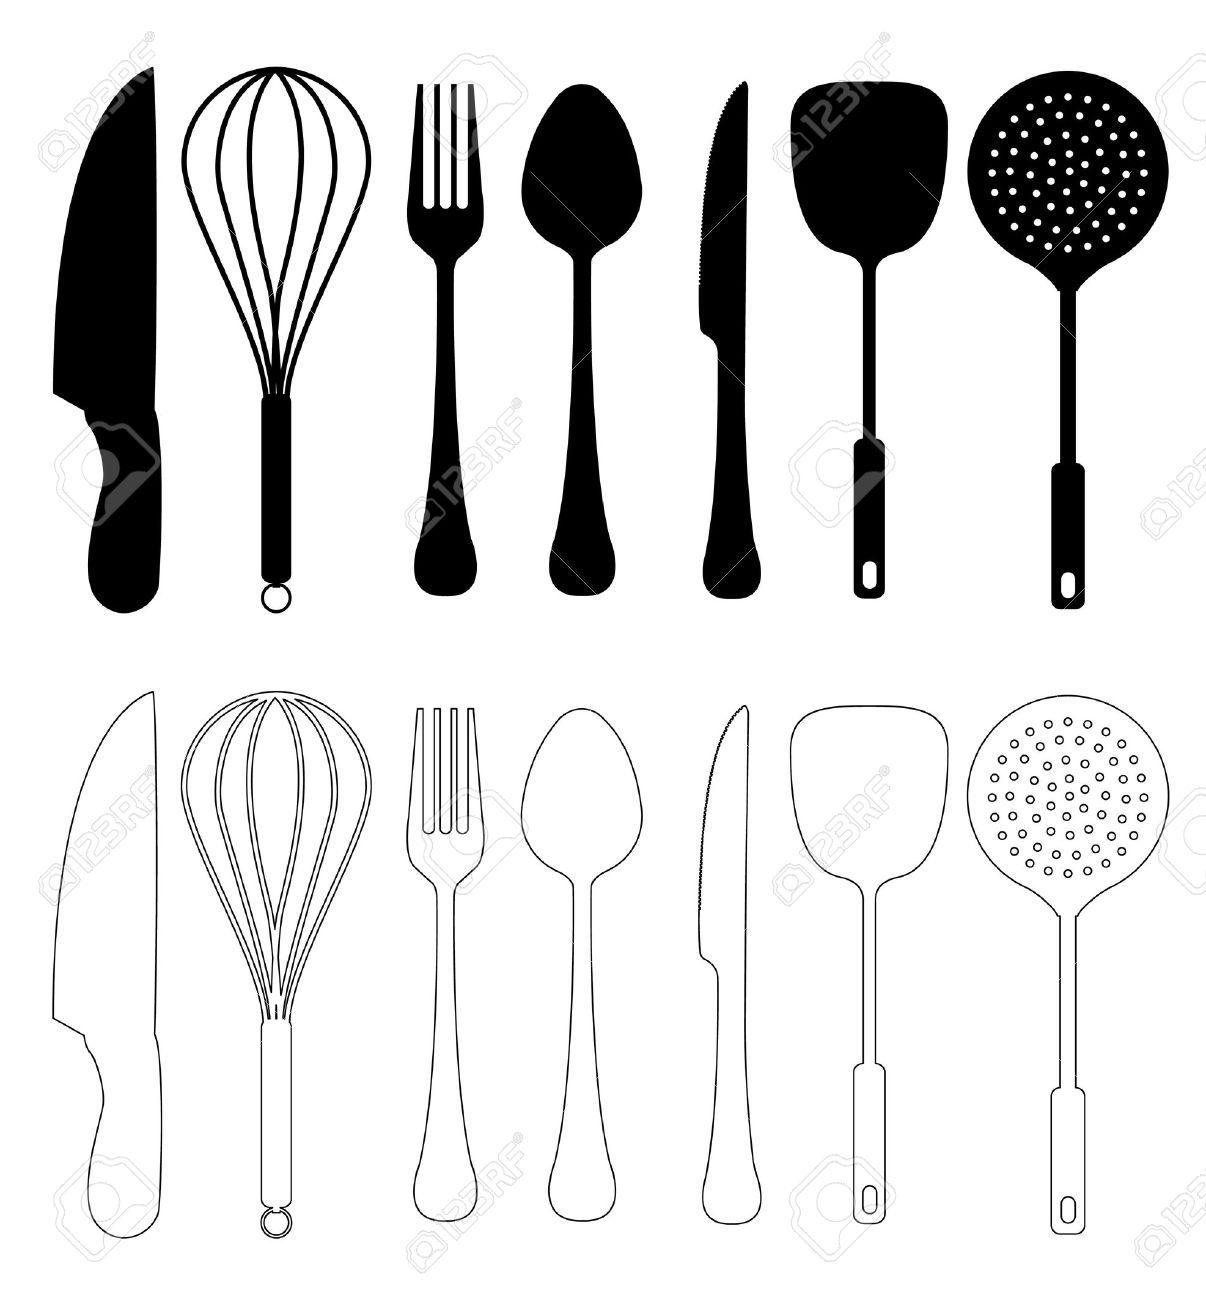 White Kitchen Utensils kitchen utensils - vector, isolated on white, kitchen utensil